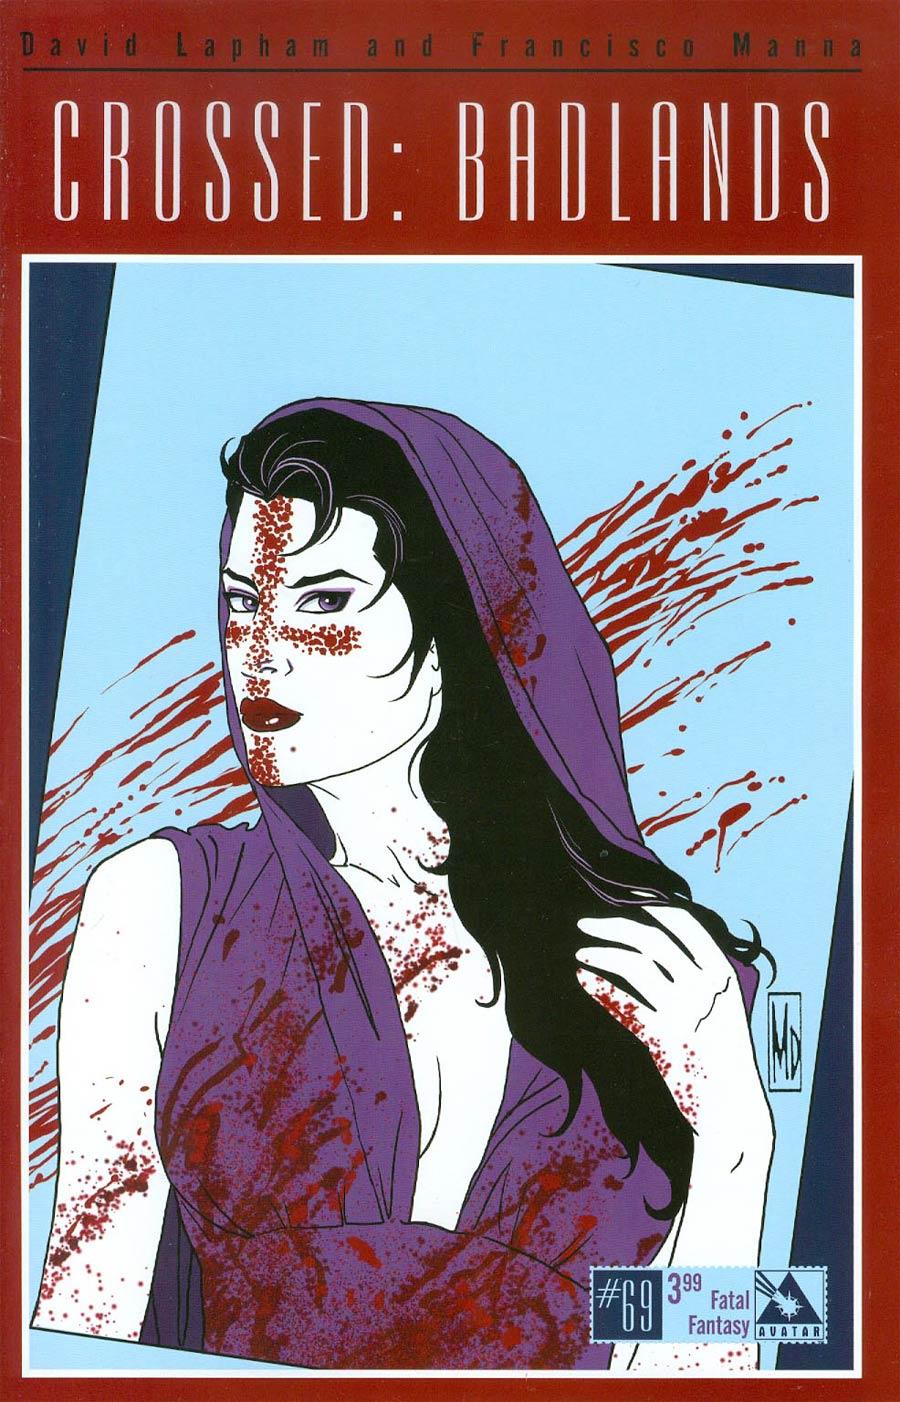 Crossed Badlands #69 Cover D Fatal Fantasy Cover